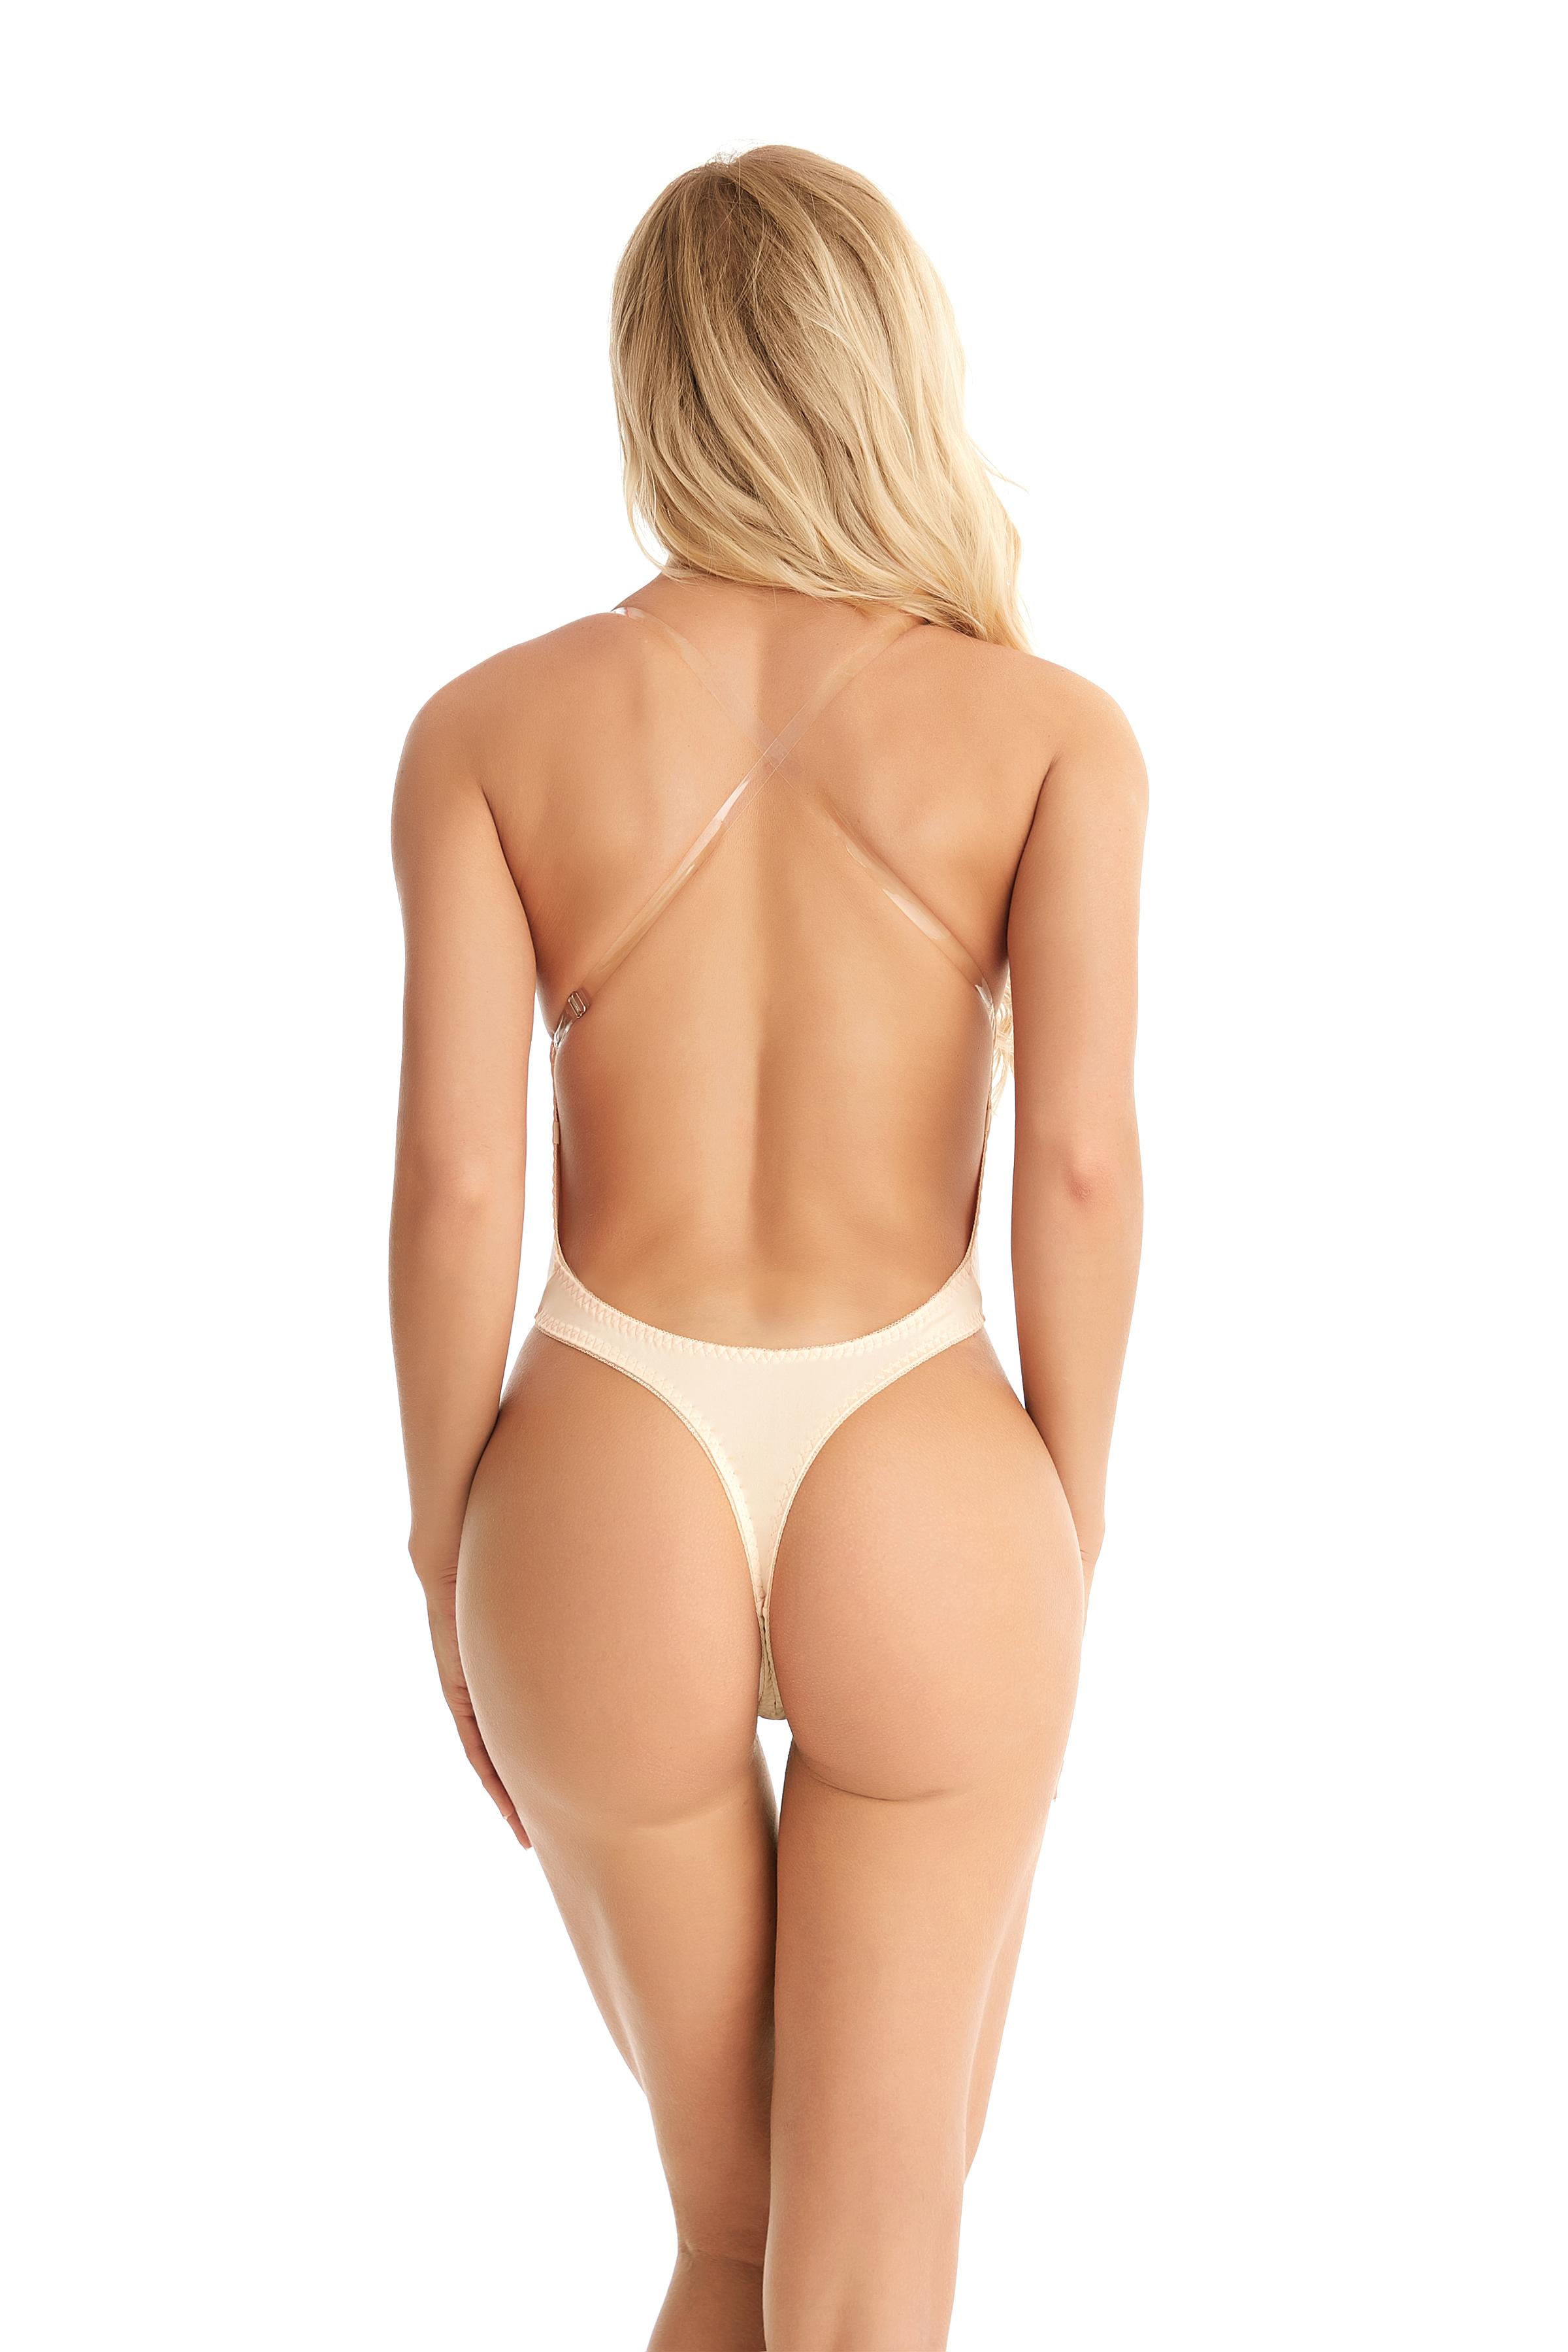 Women U Plunge Backless Underwear Invisible Full Body Bra Thong Shaper G-strings